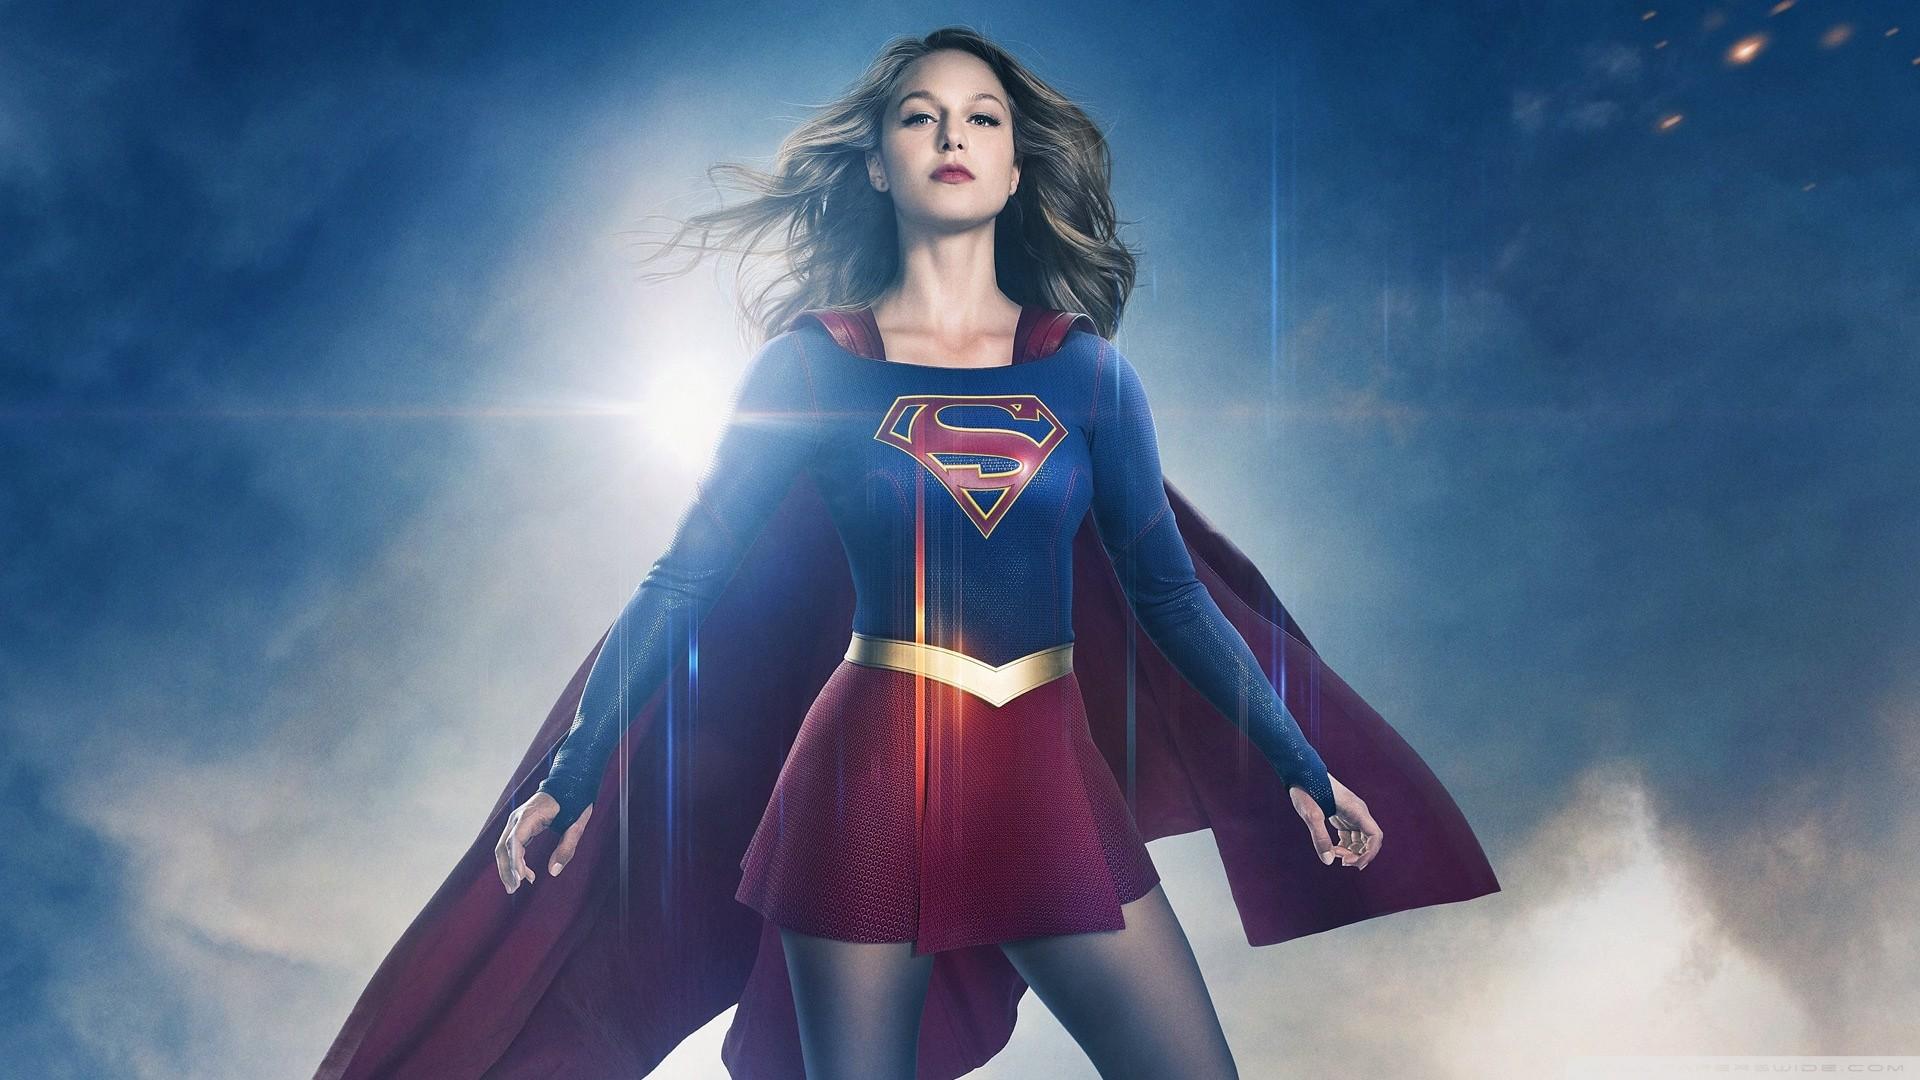 Supergirl Hd Wallpapers 1080p Supergirl Wallpaper 1080p 72 Images